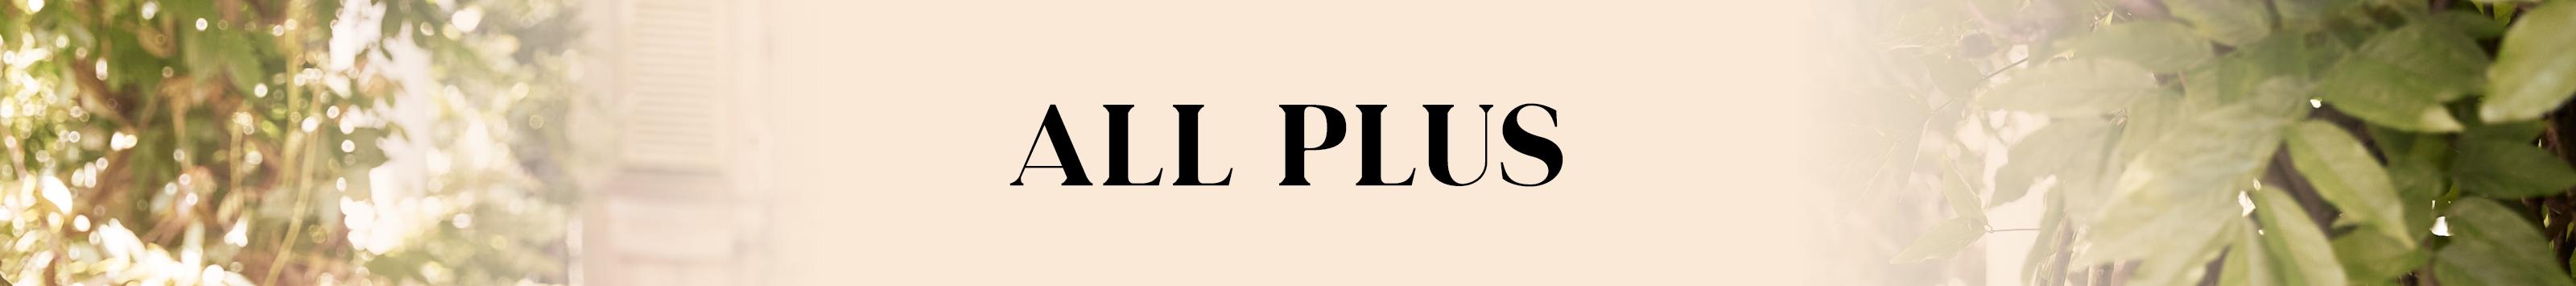 banner-category-plussize-allplus-1.jpg